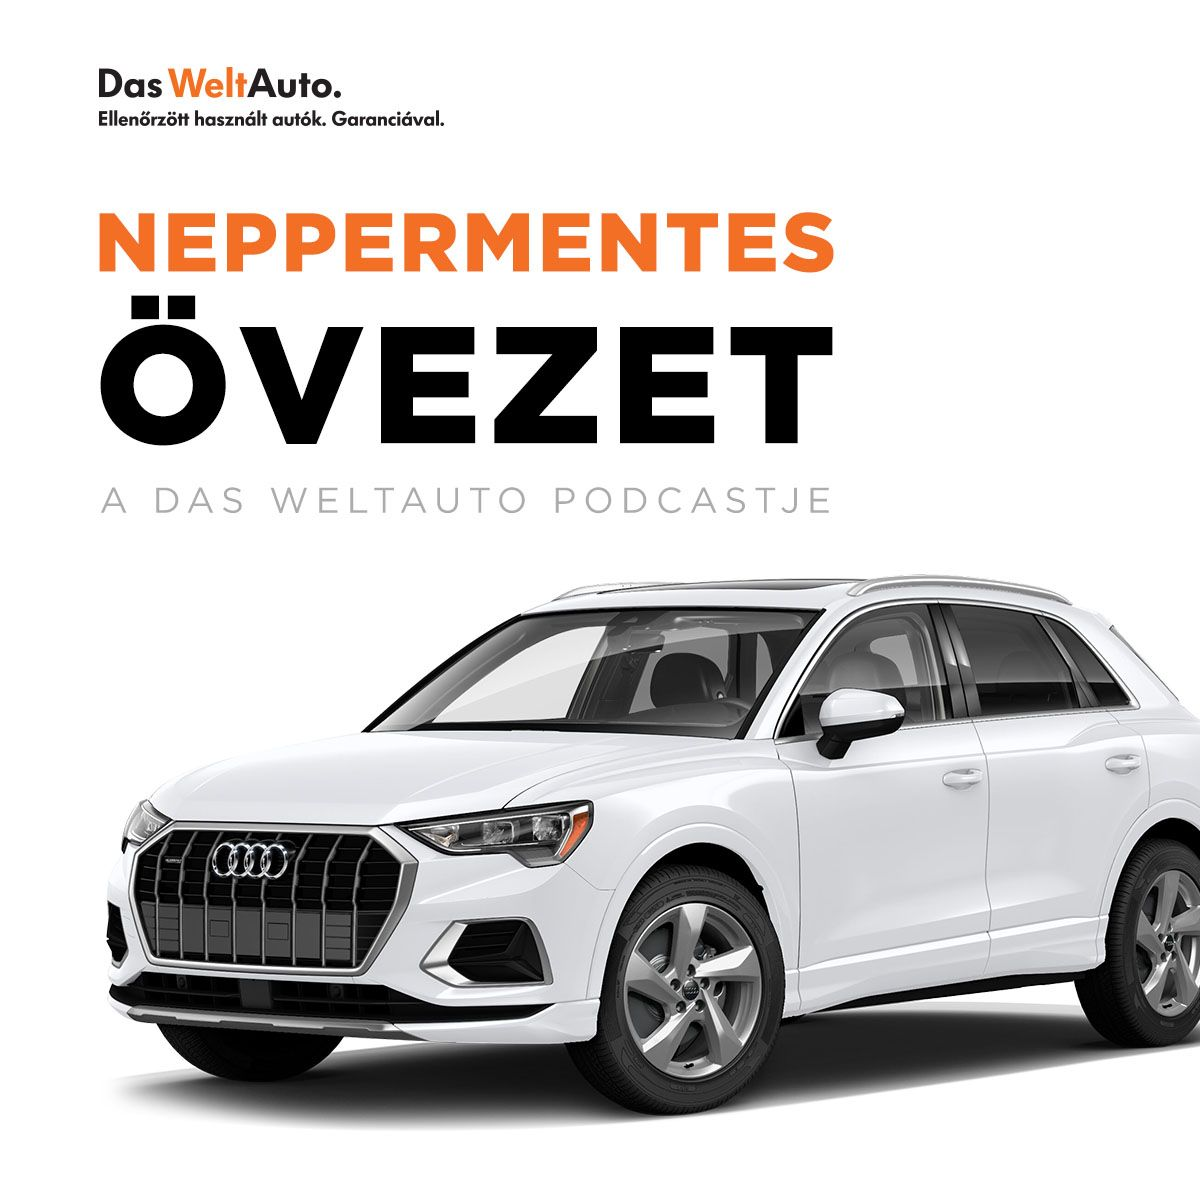 DWA_neppermentes_1